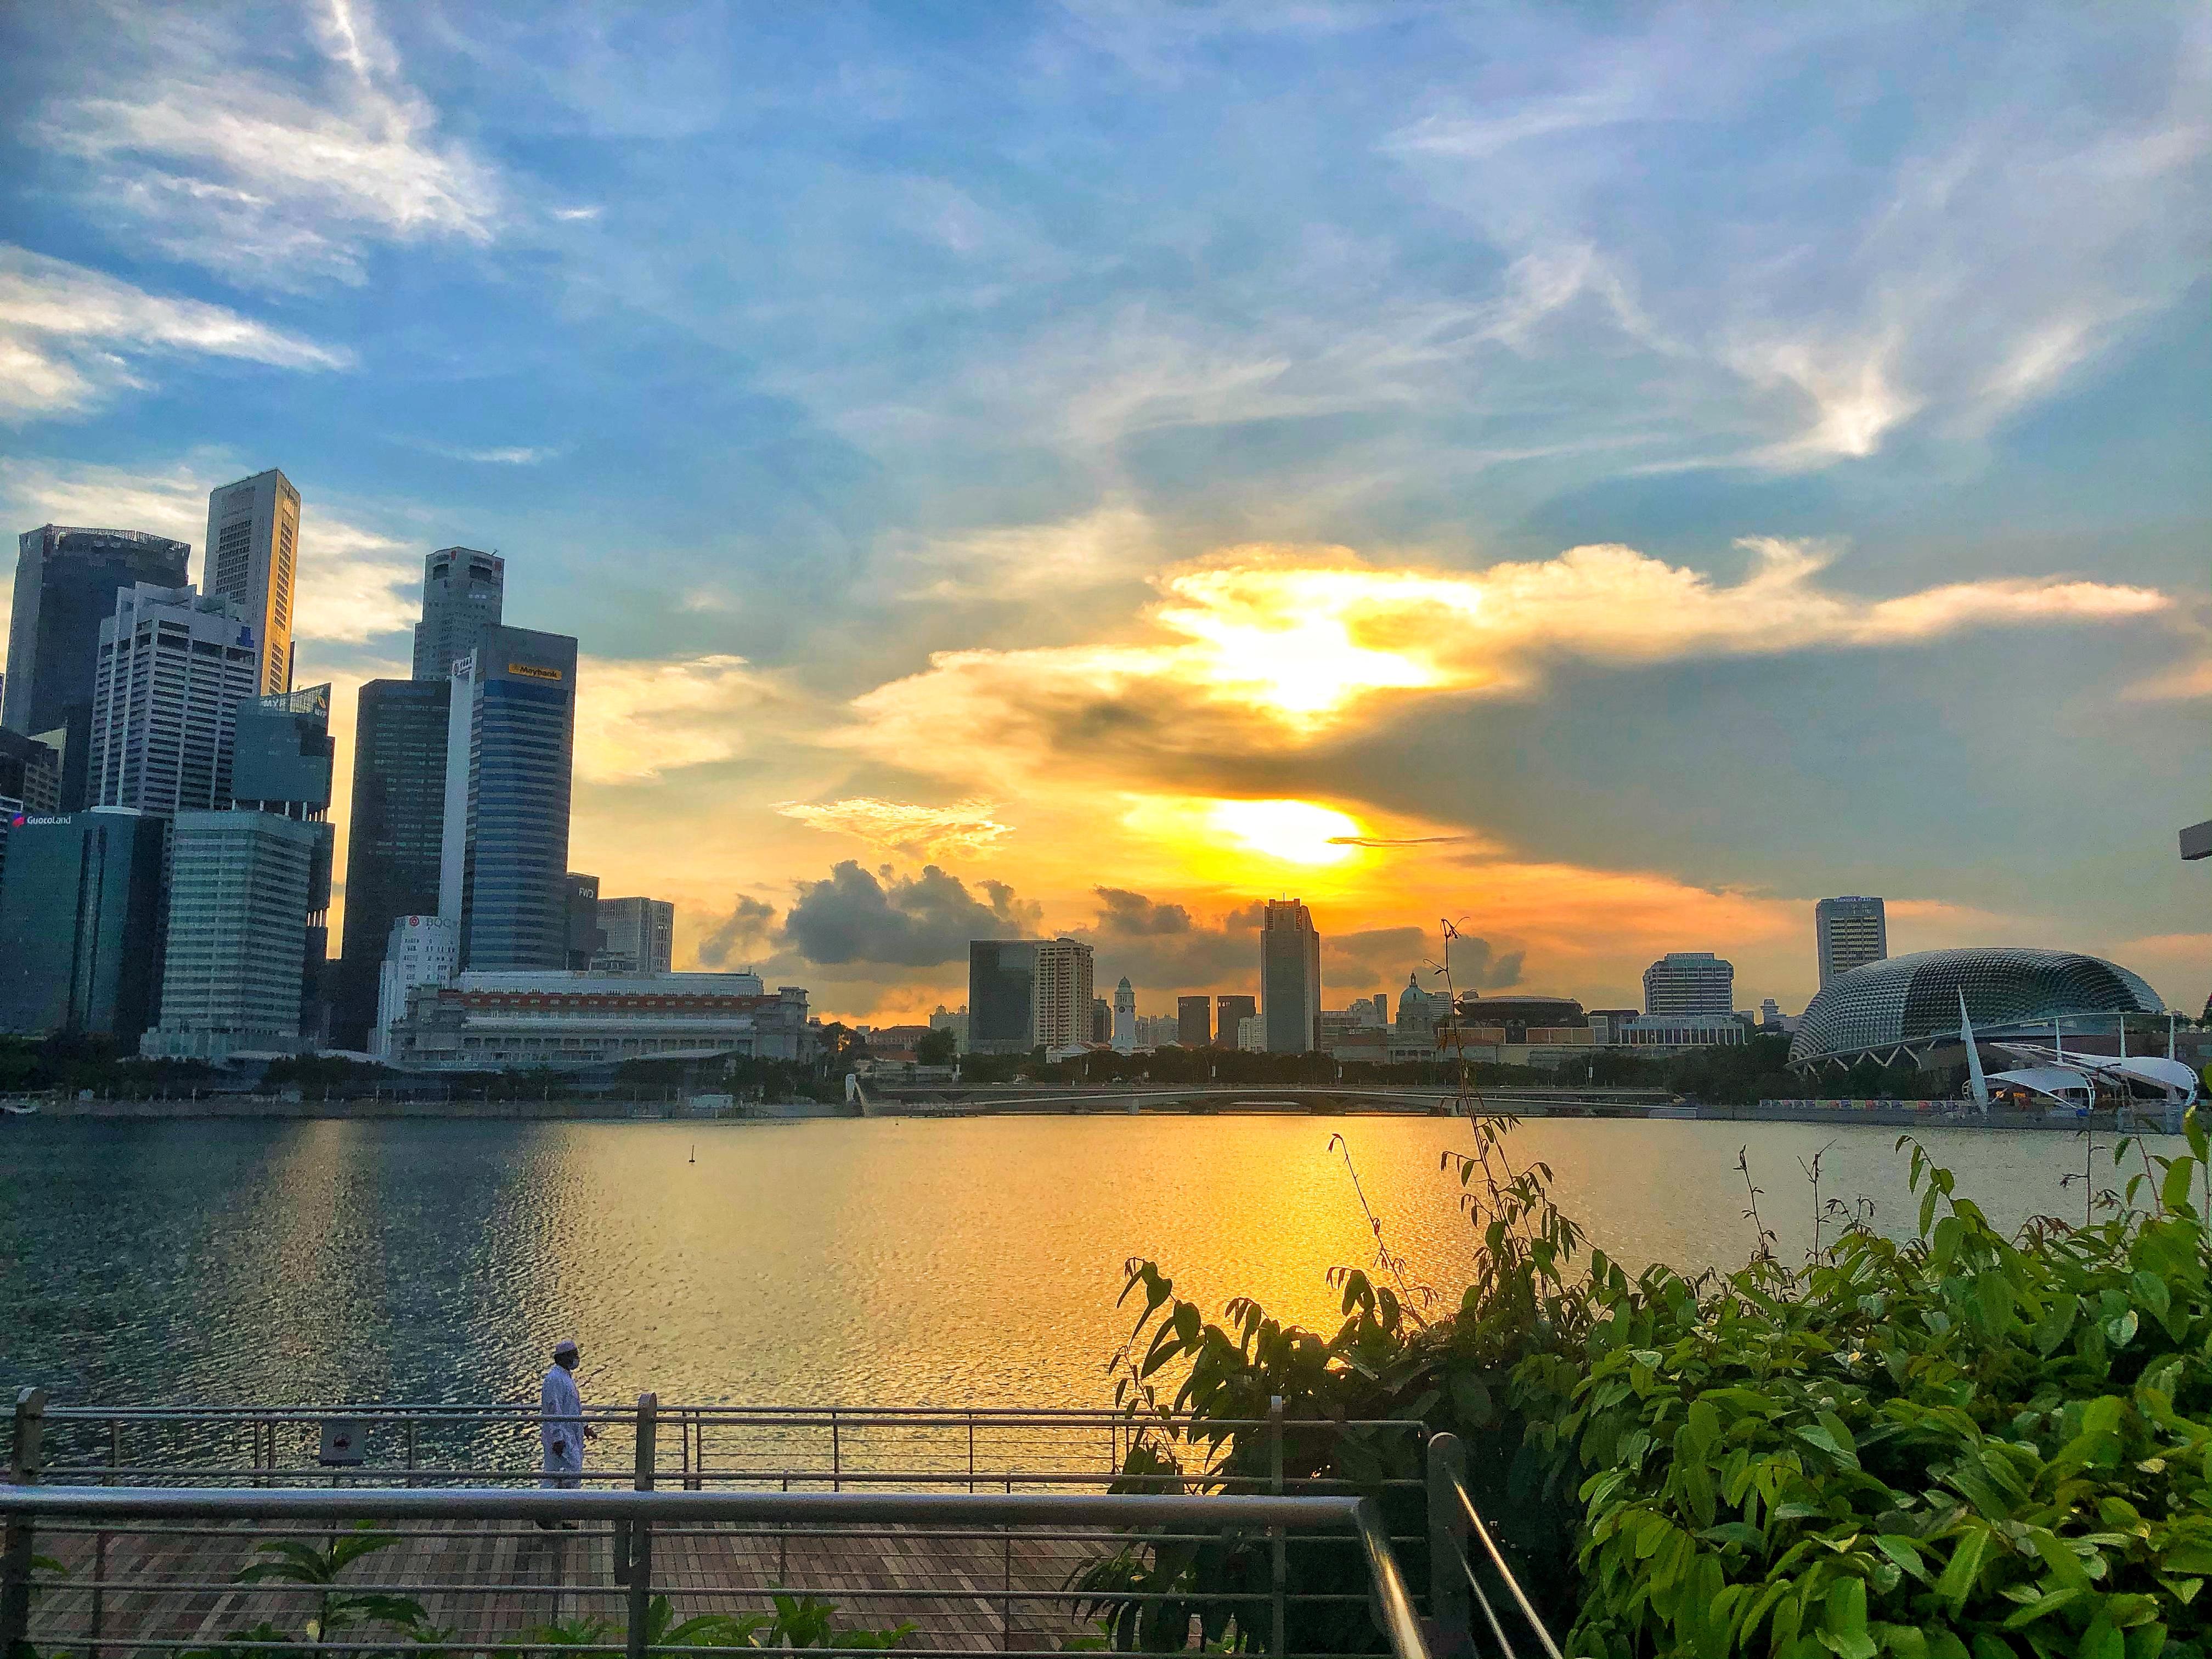 city view of Singapore